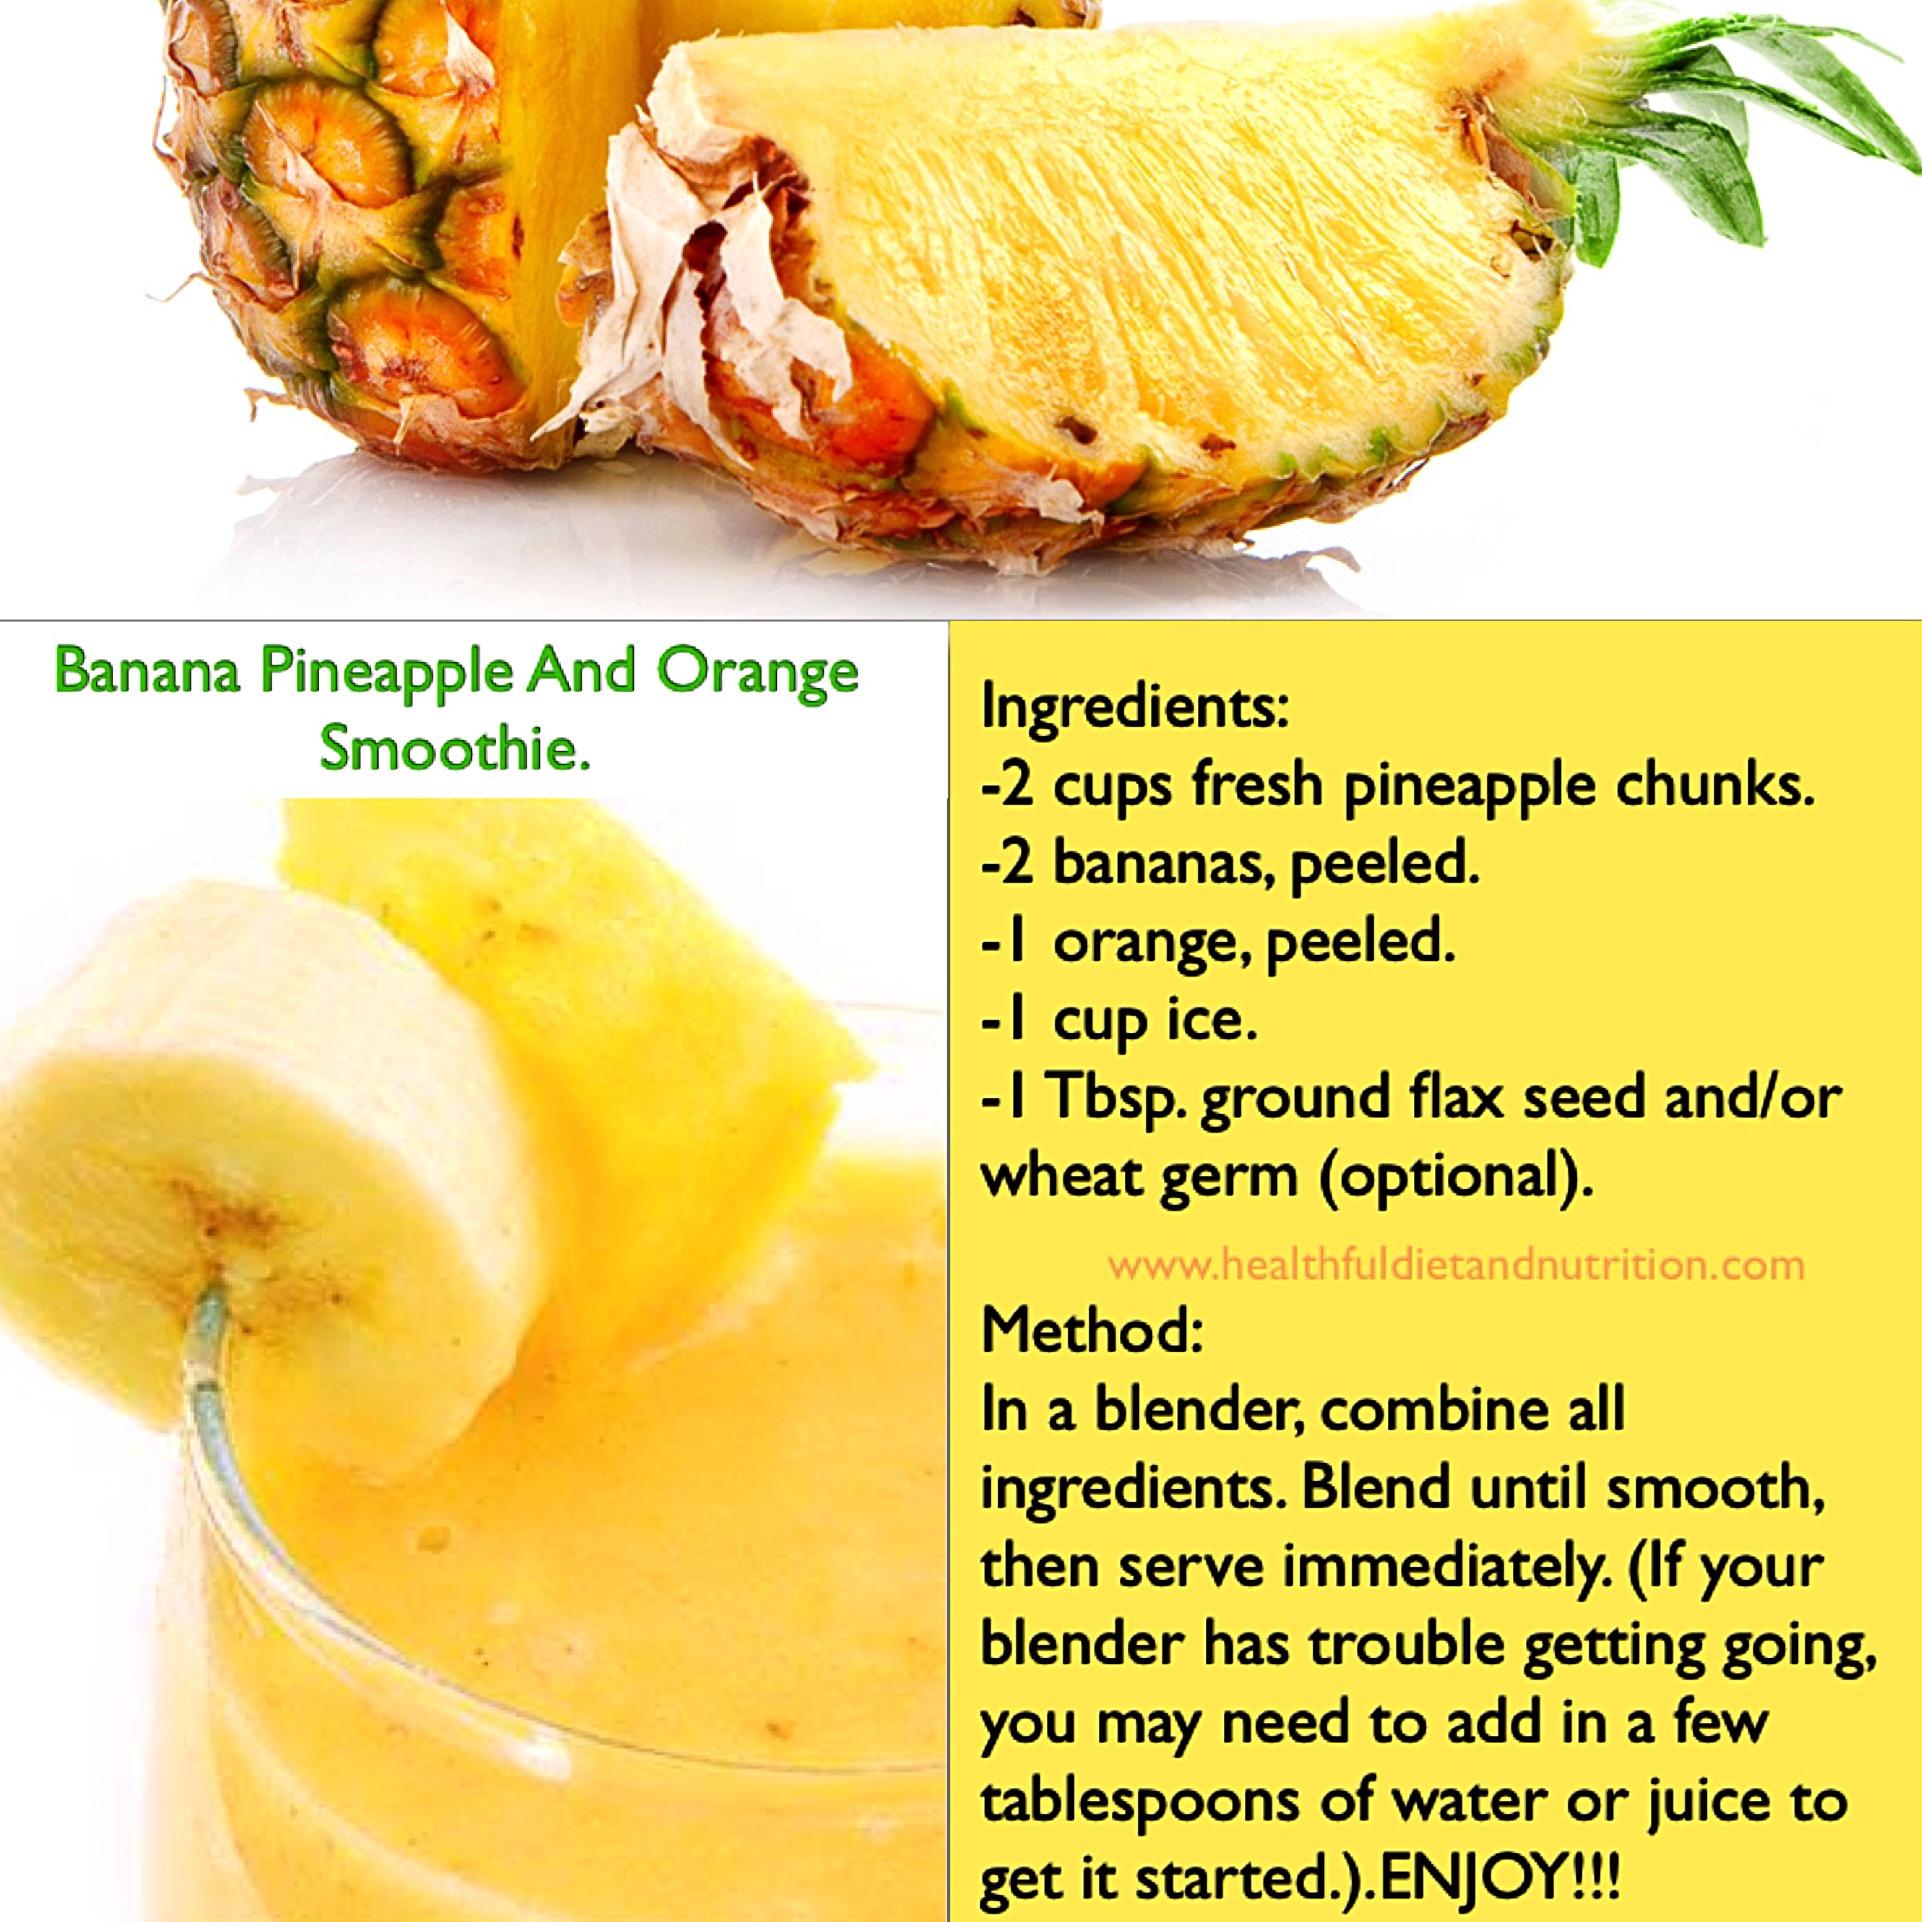 Banana, Pineapple And Orange Smoothie